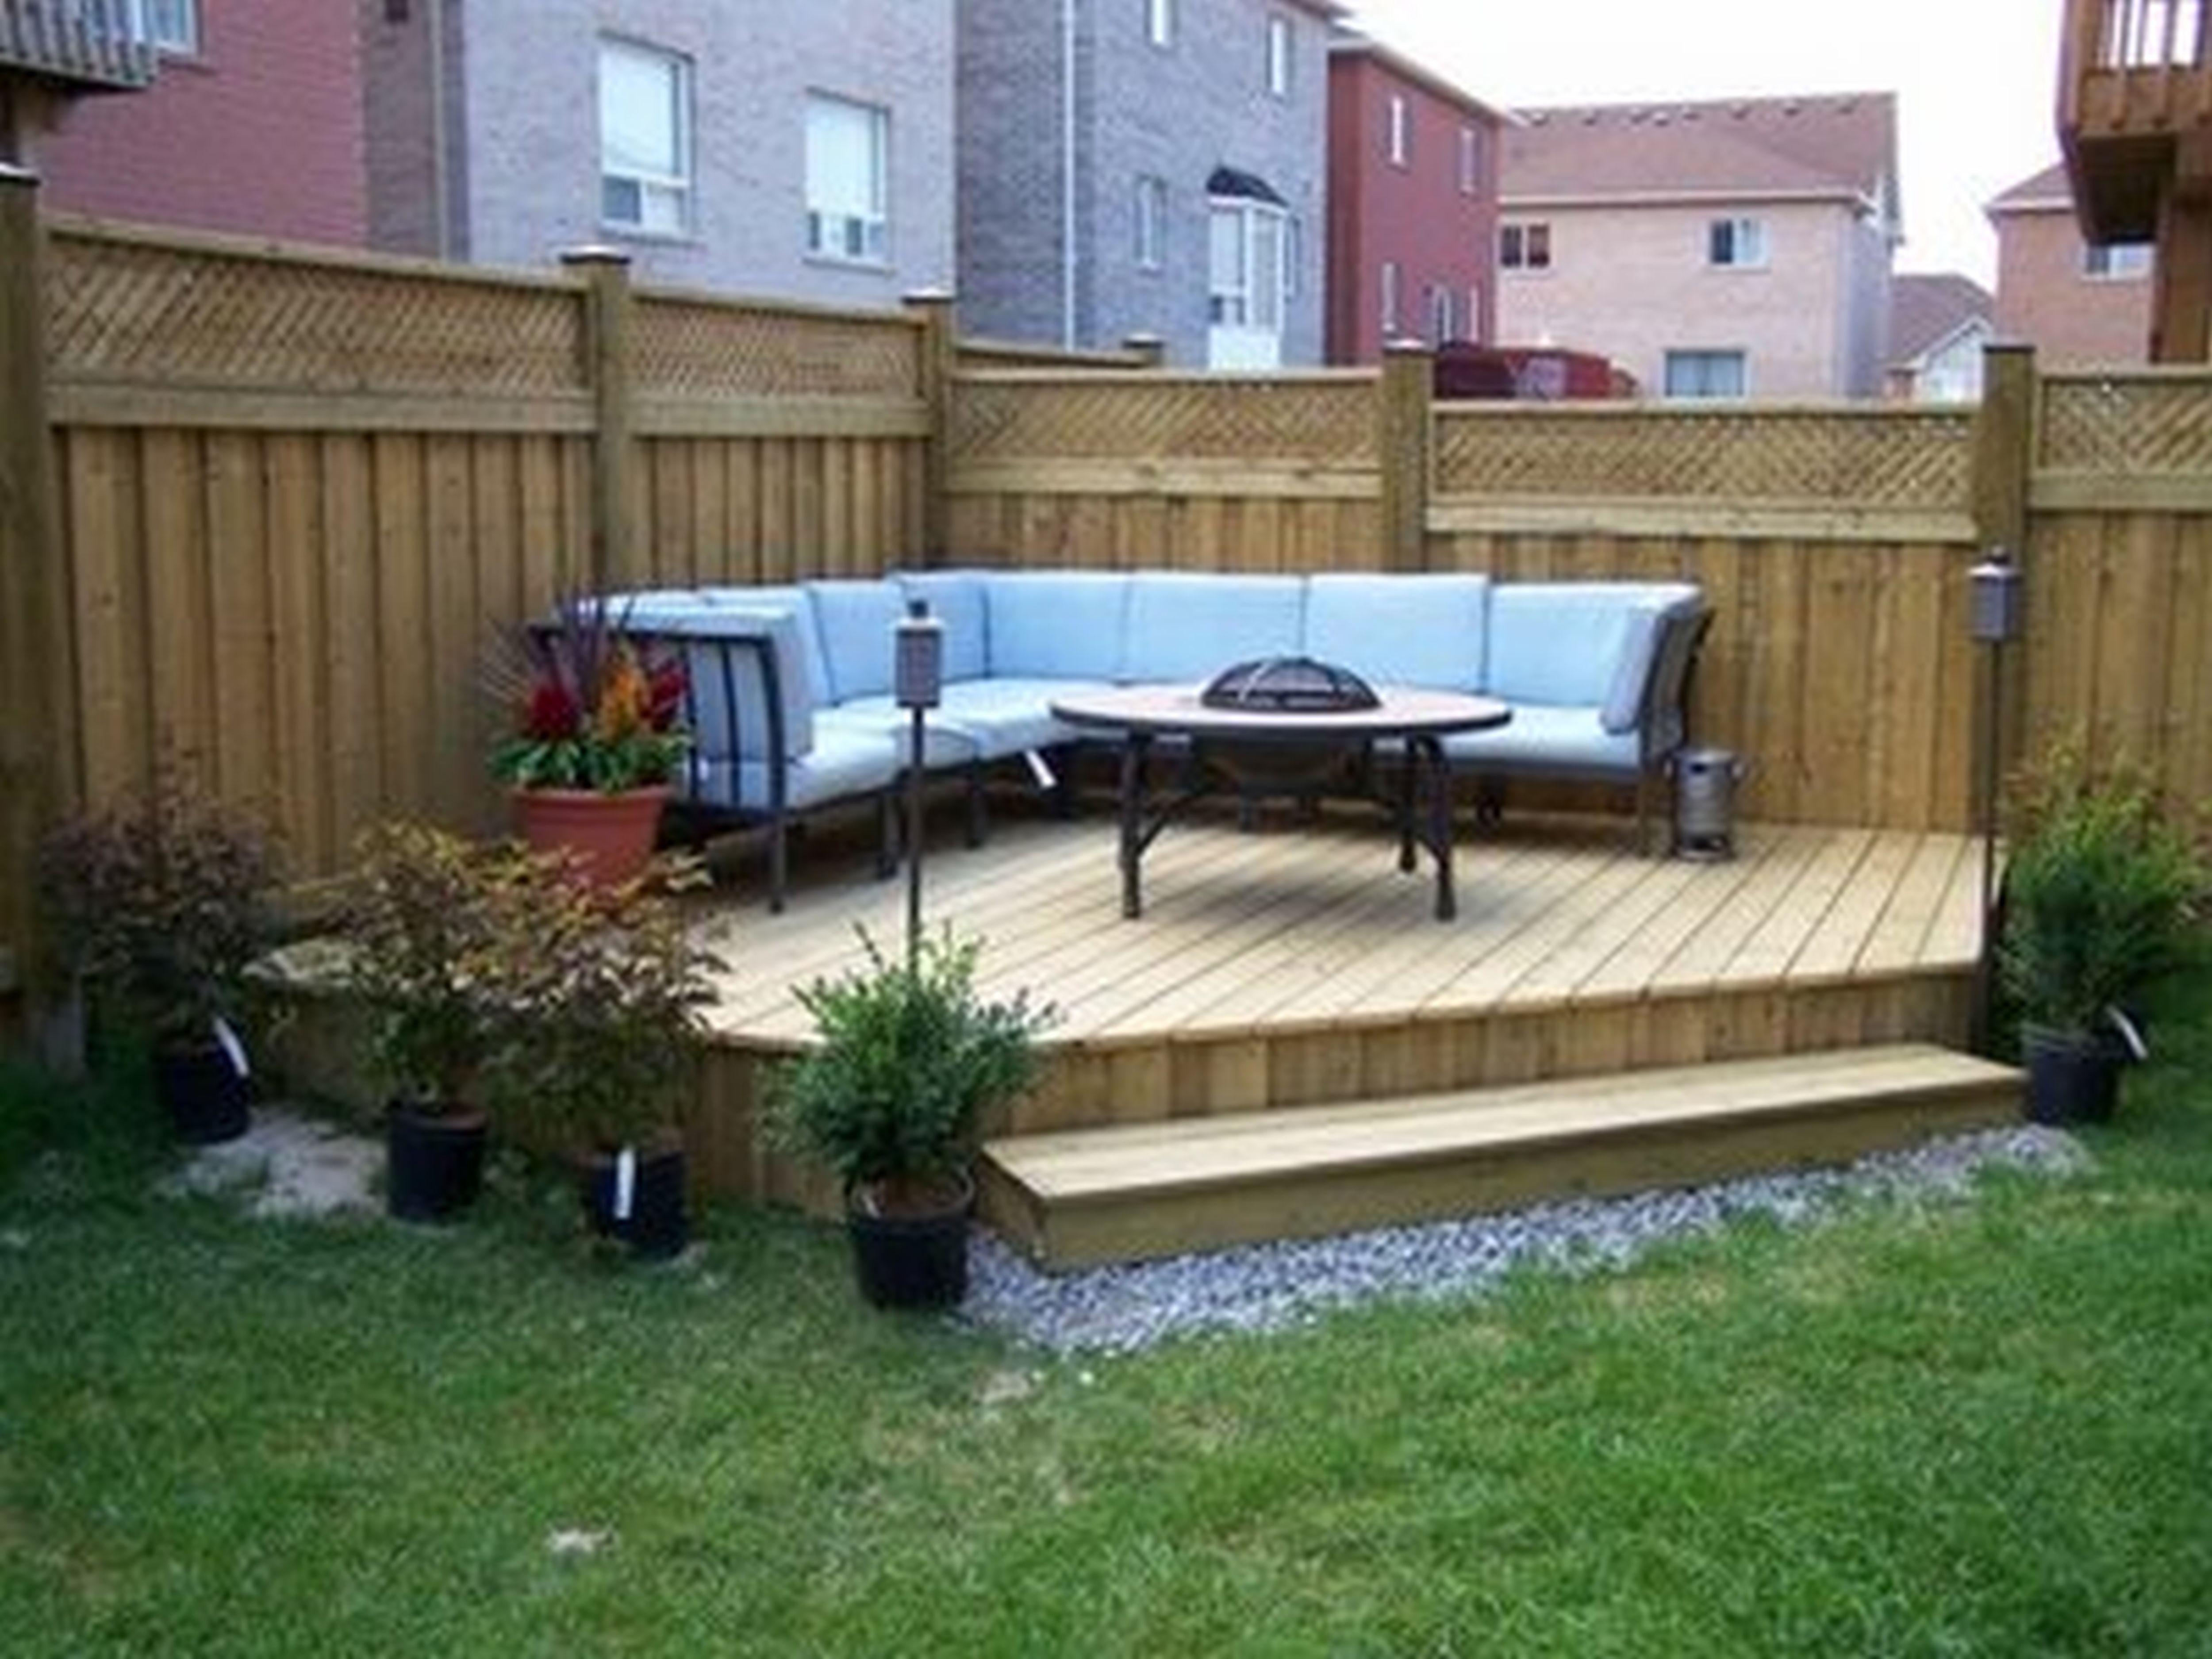 Backyard landscape ideas on a budget - large and beautiful ... on Backyard Designs On A Budget id=51413